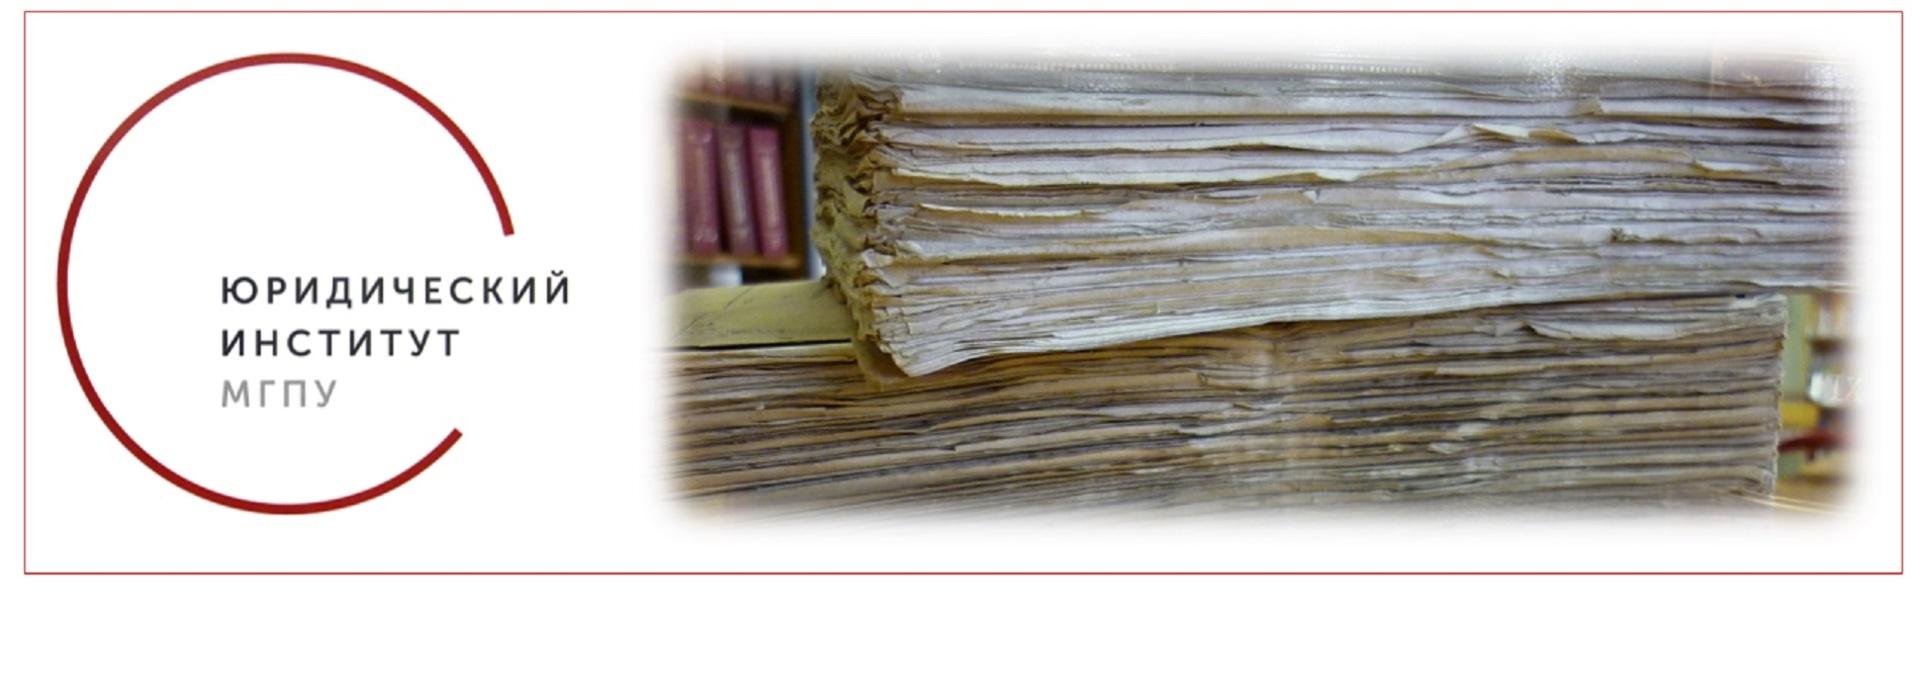 Кафедра теории и истории государства и права